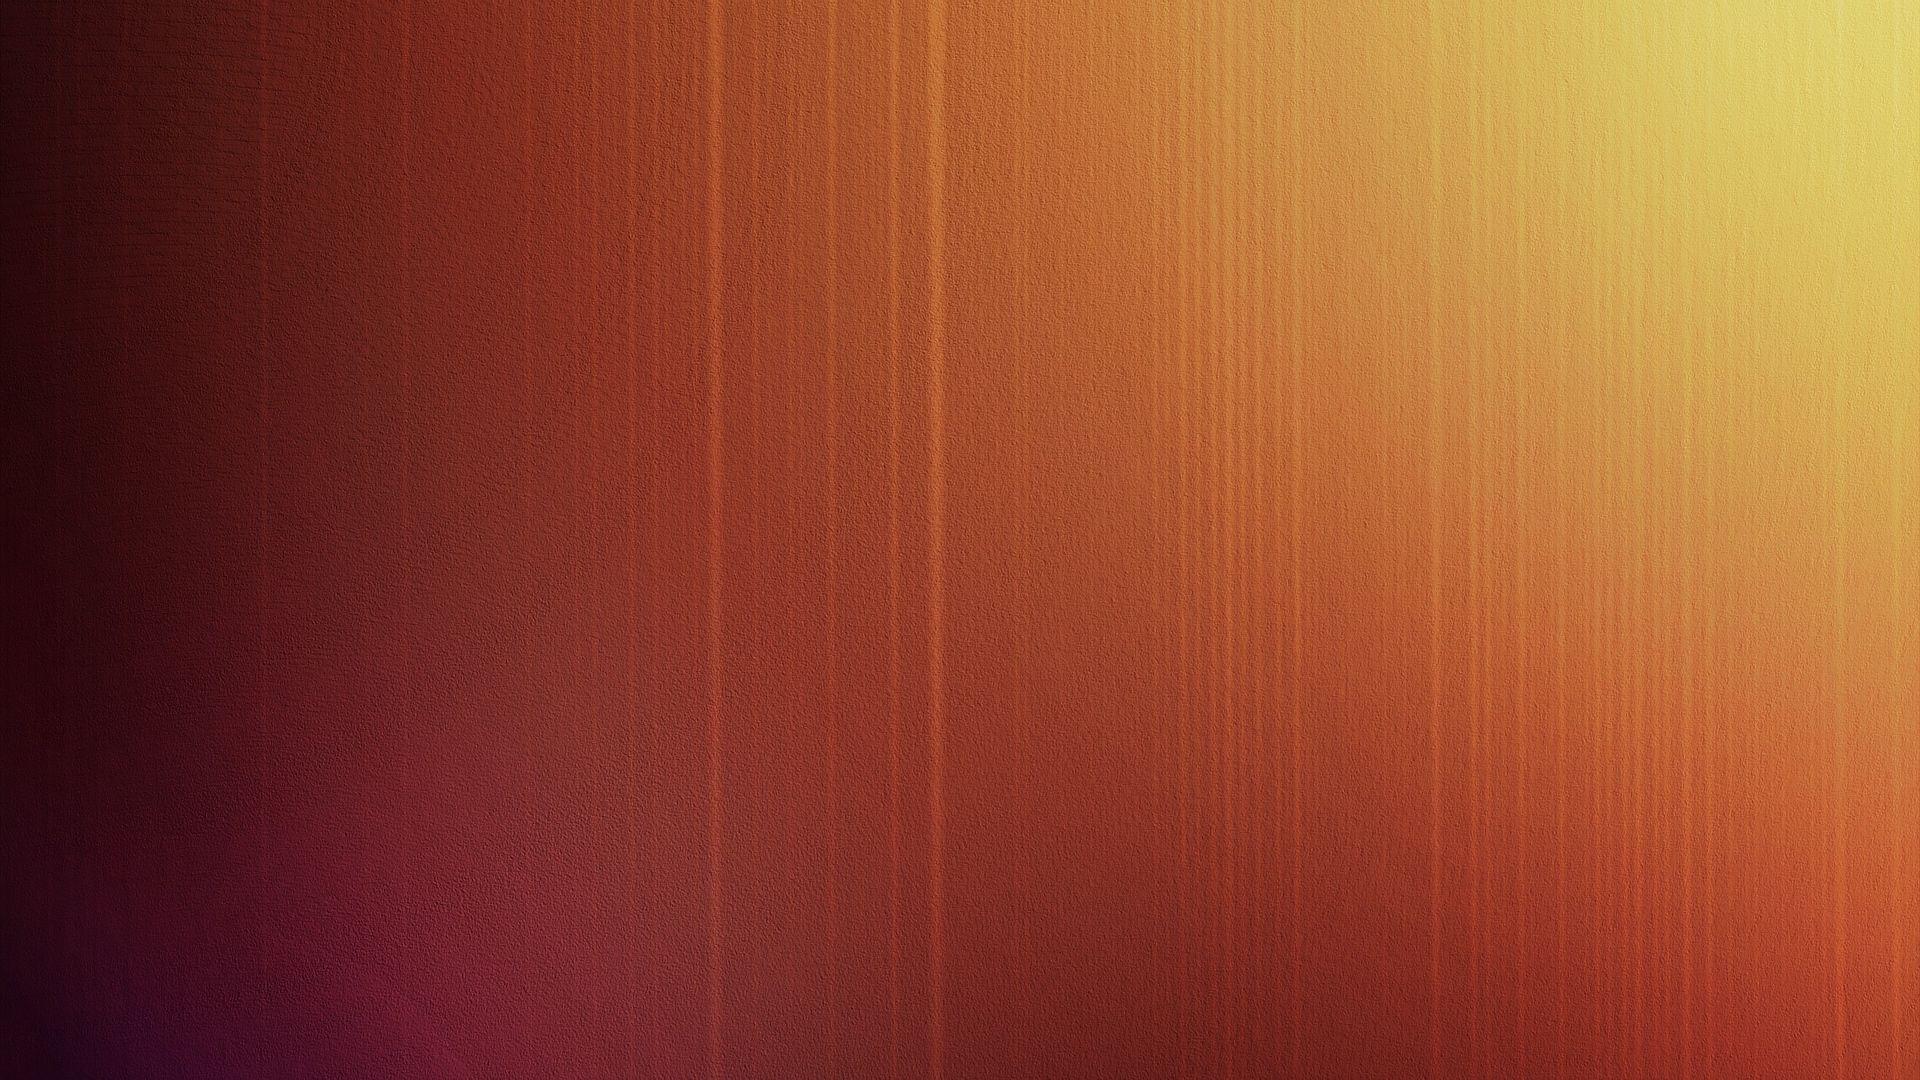 Best Background For Website laptop background wallpaper